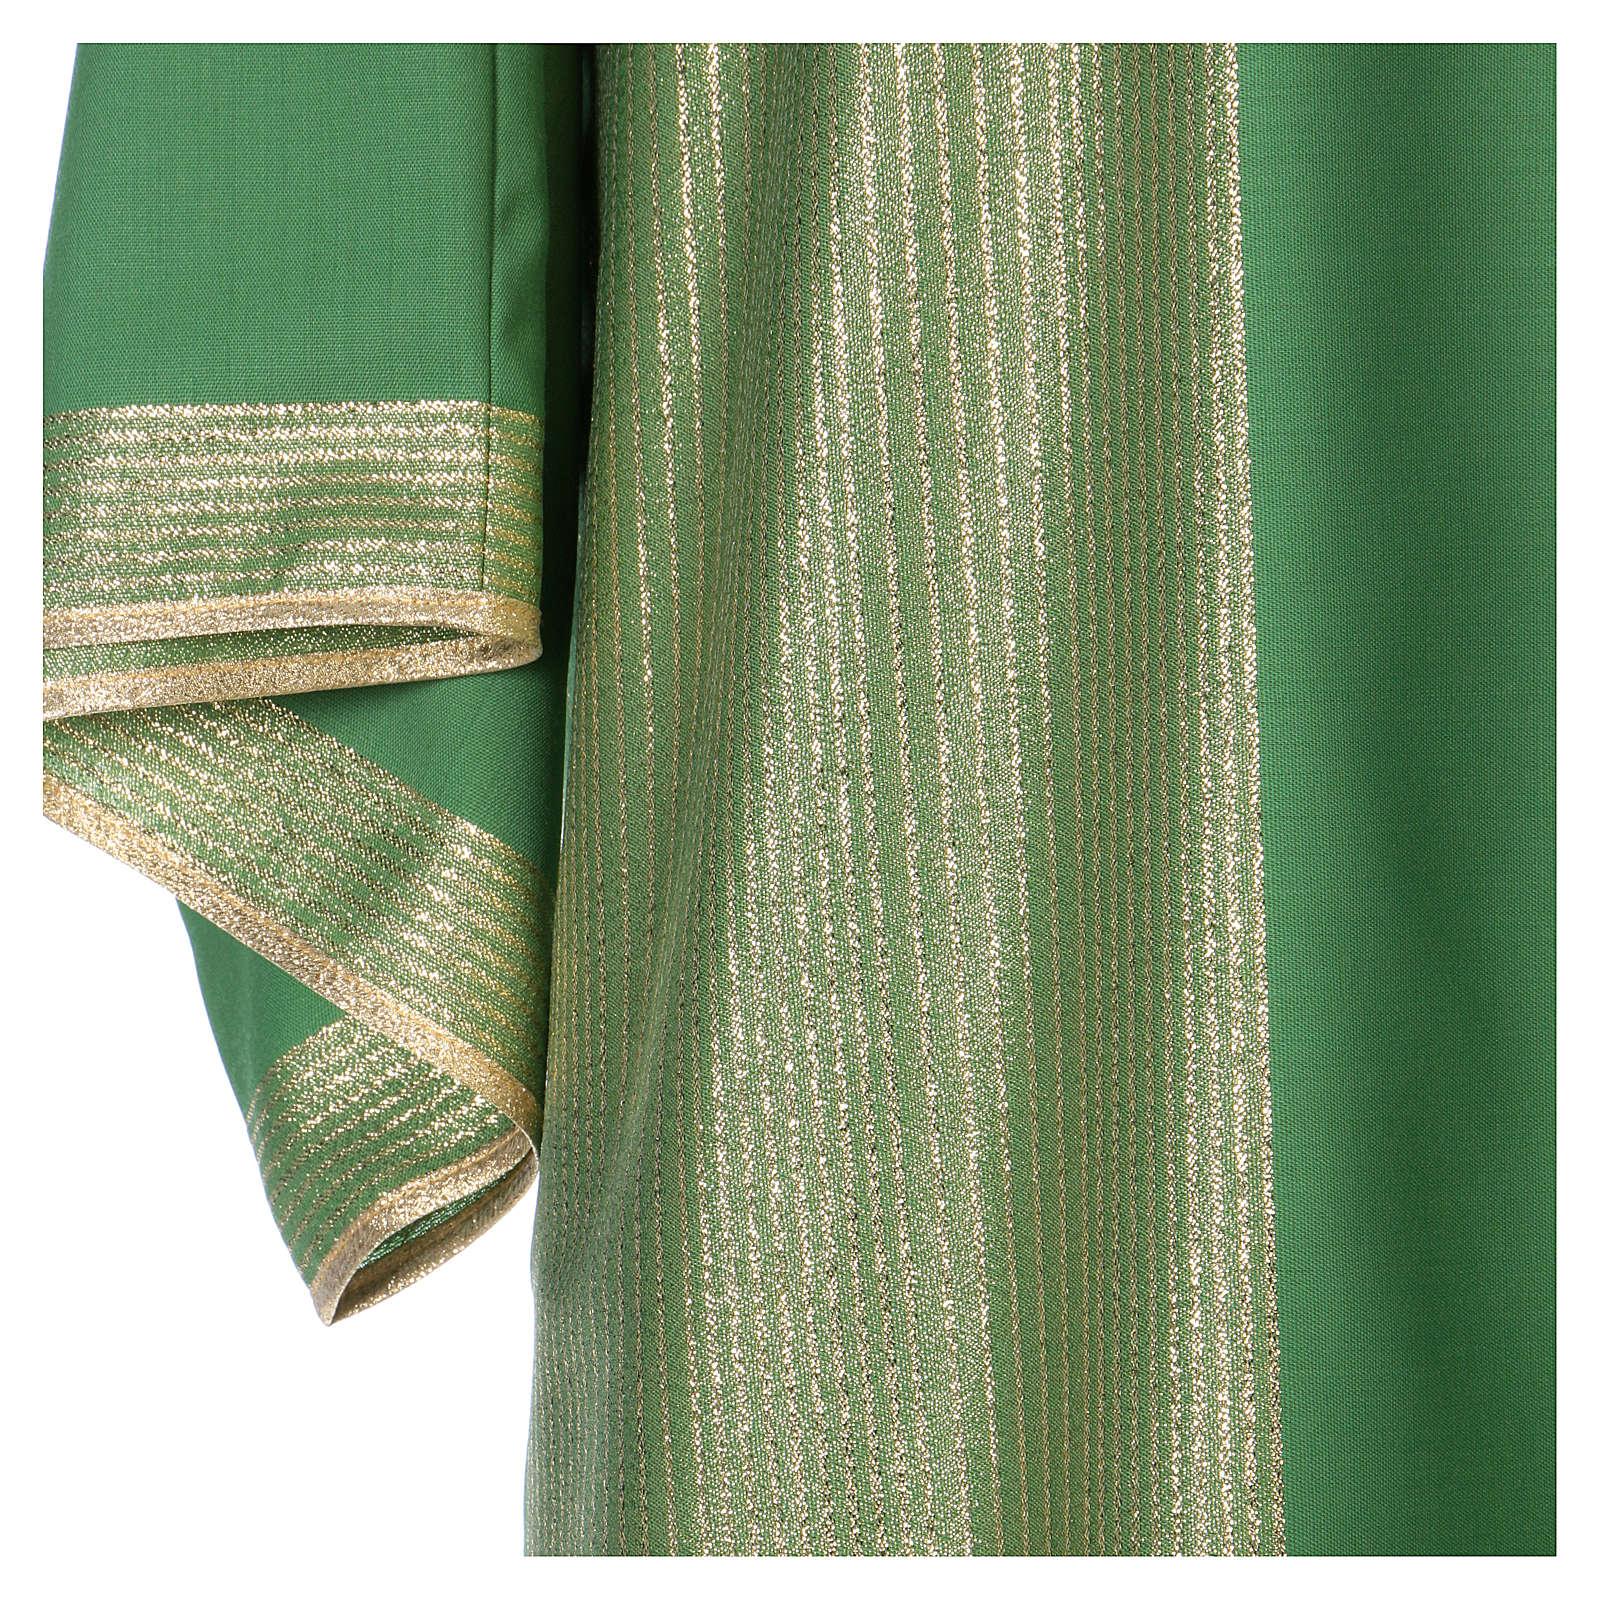 Dalmatica pura lana 4